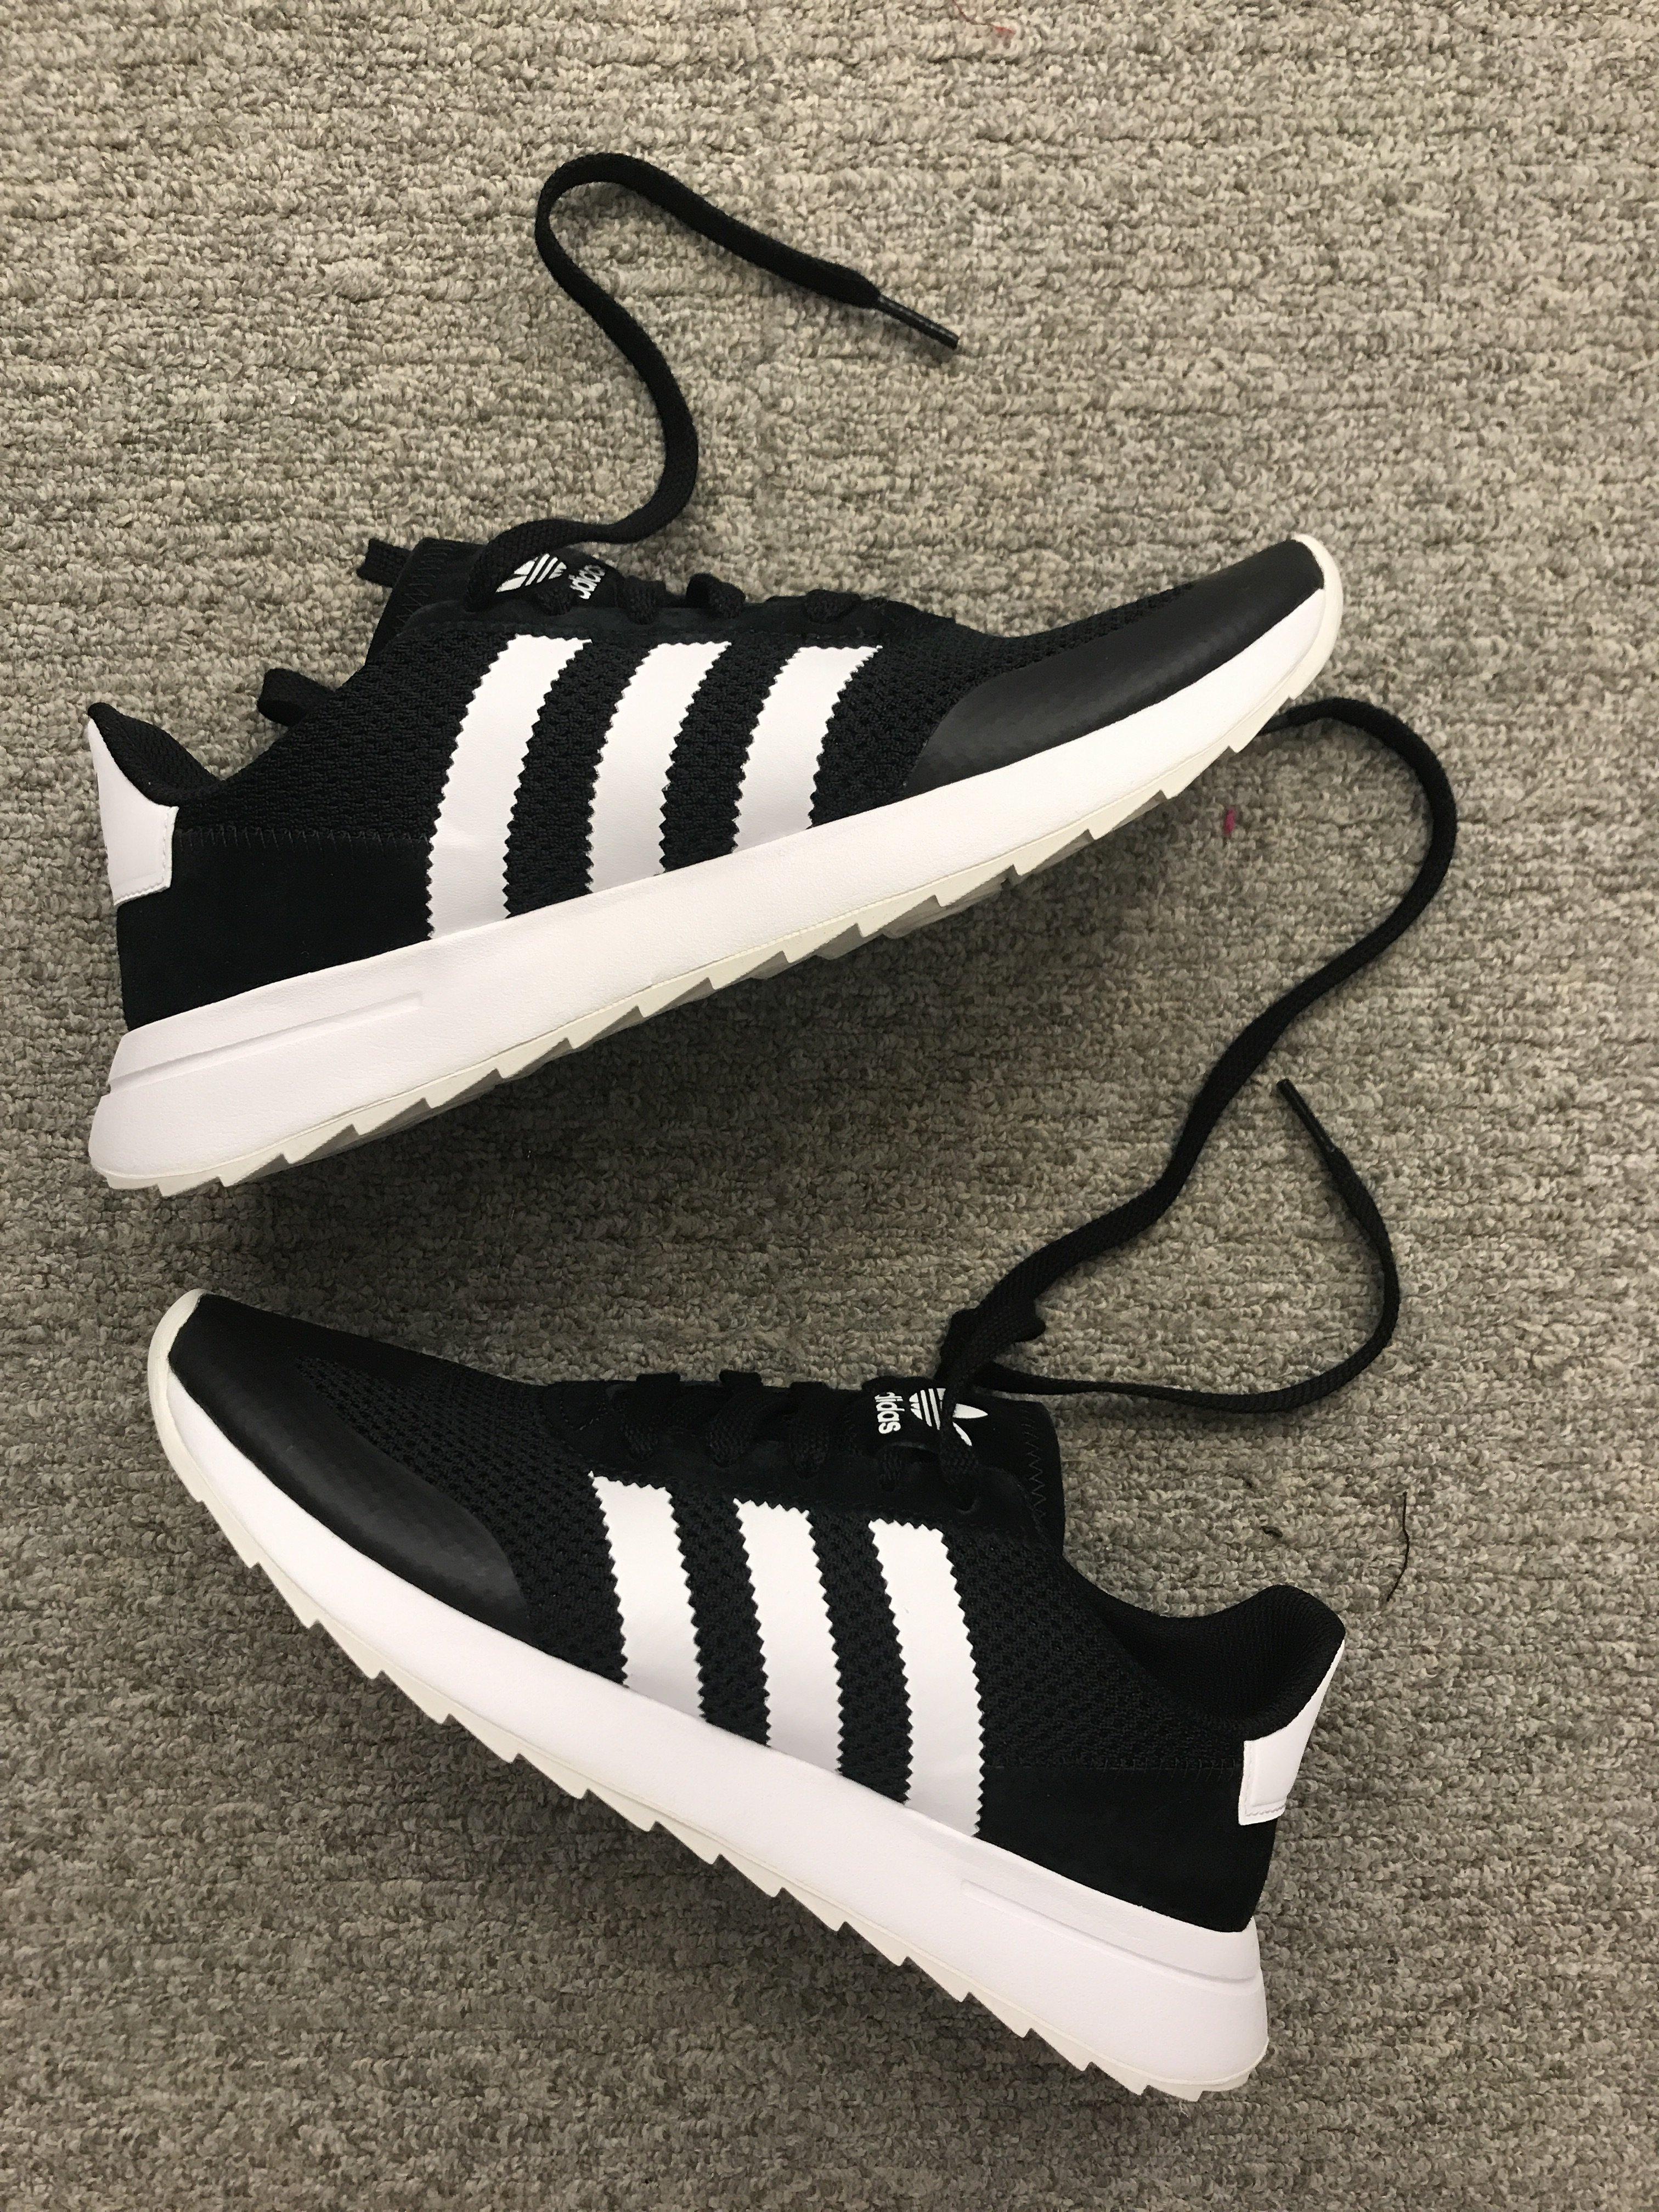 Nordstrom Anniversary Sale 2018 | Adidas Sneakers